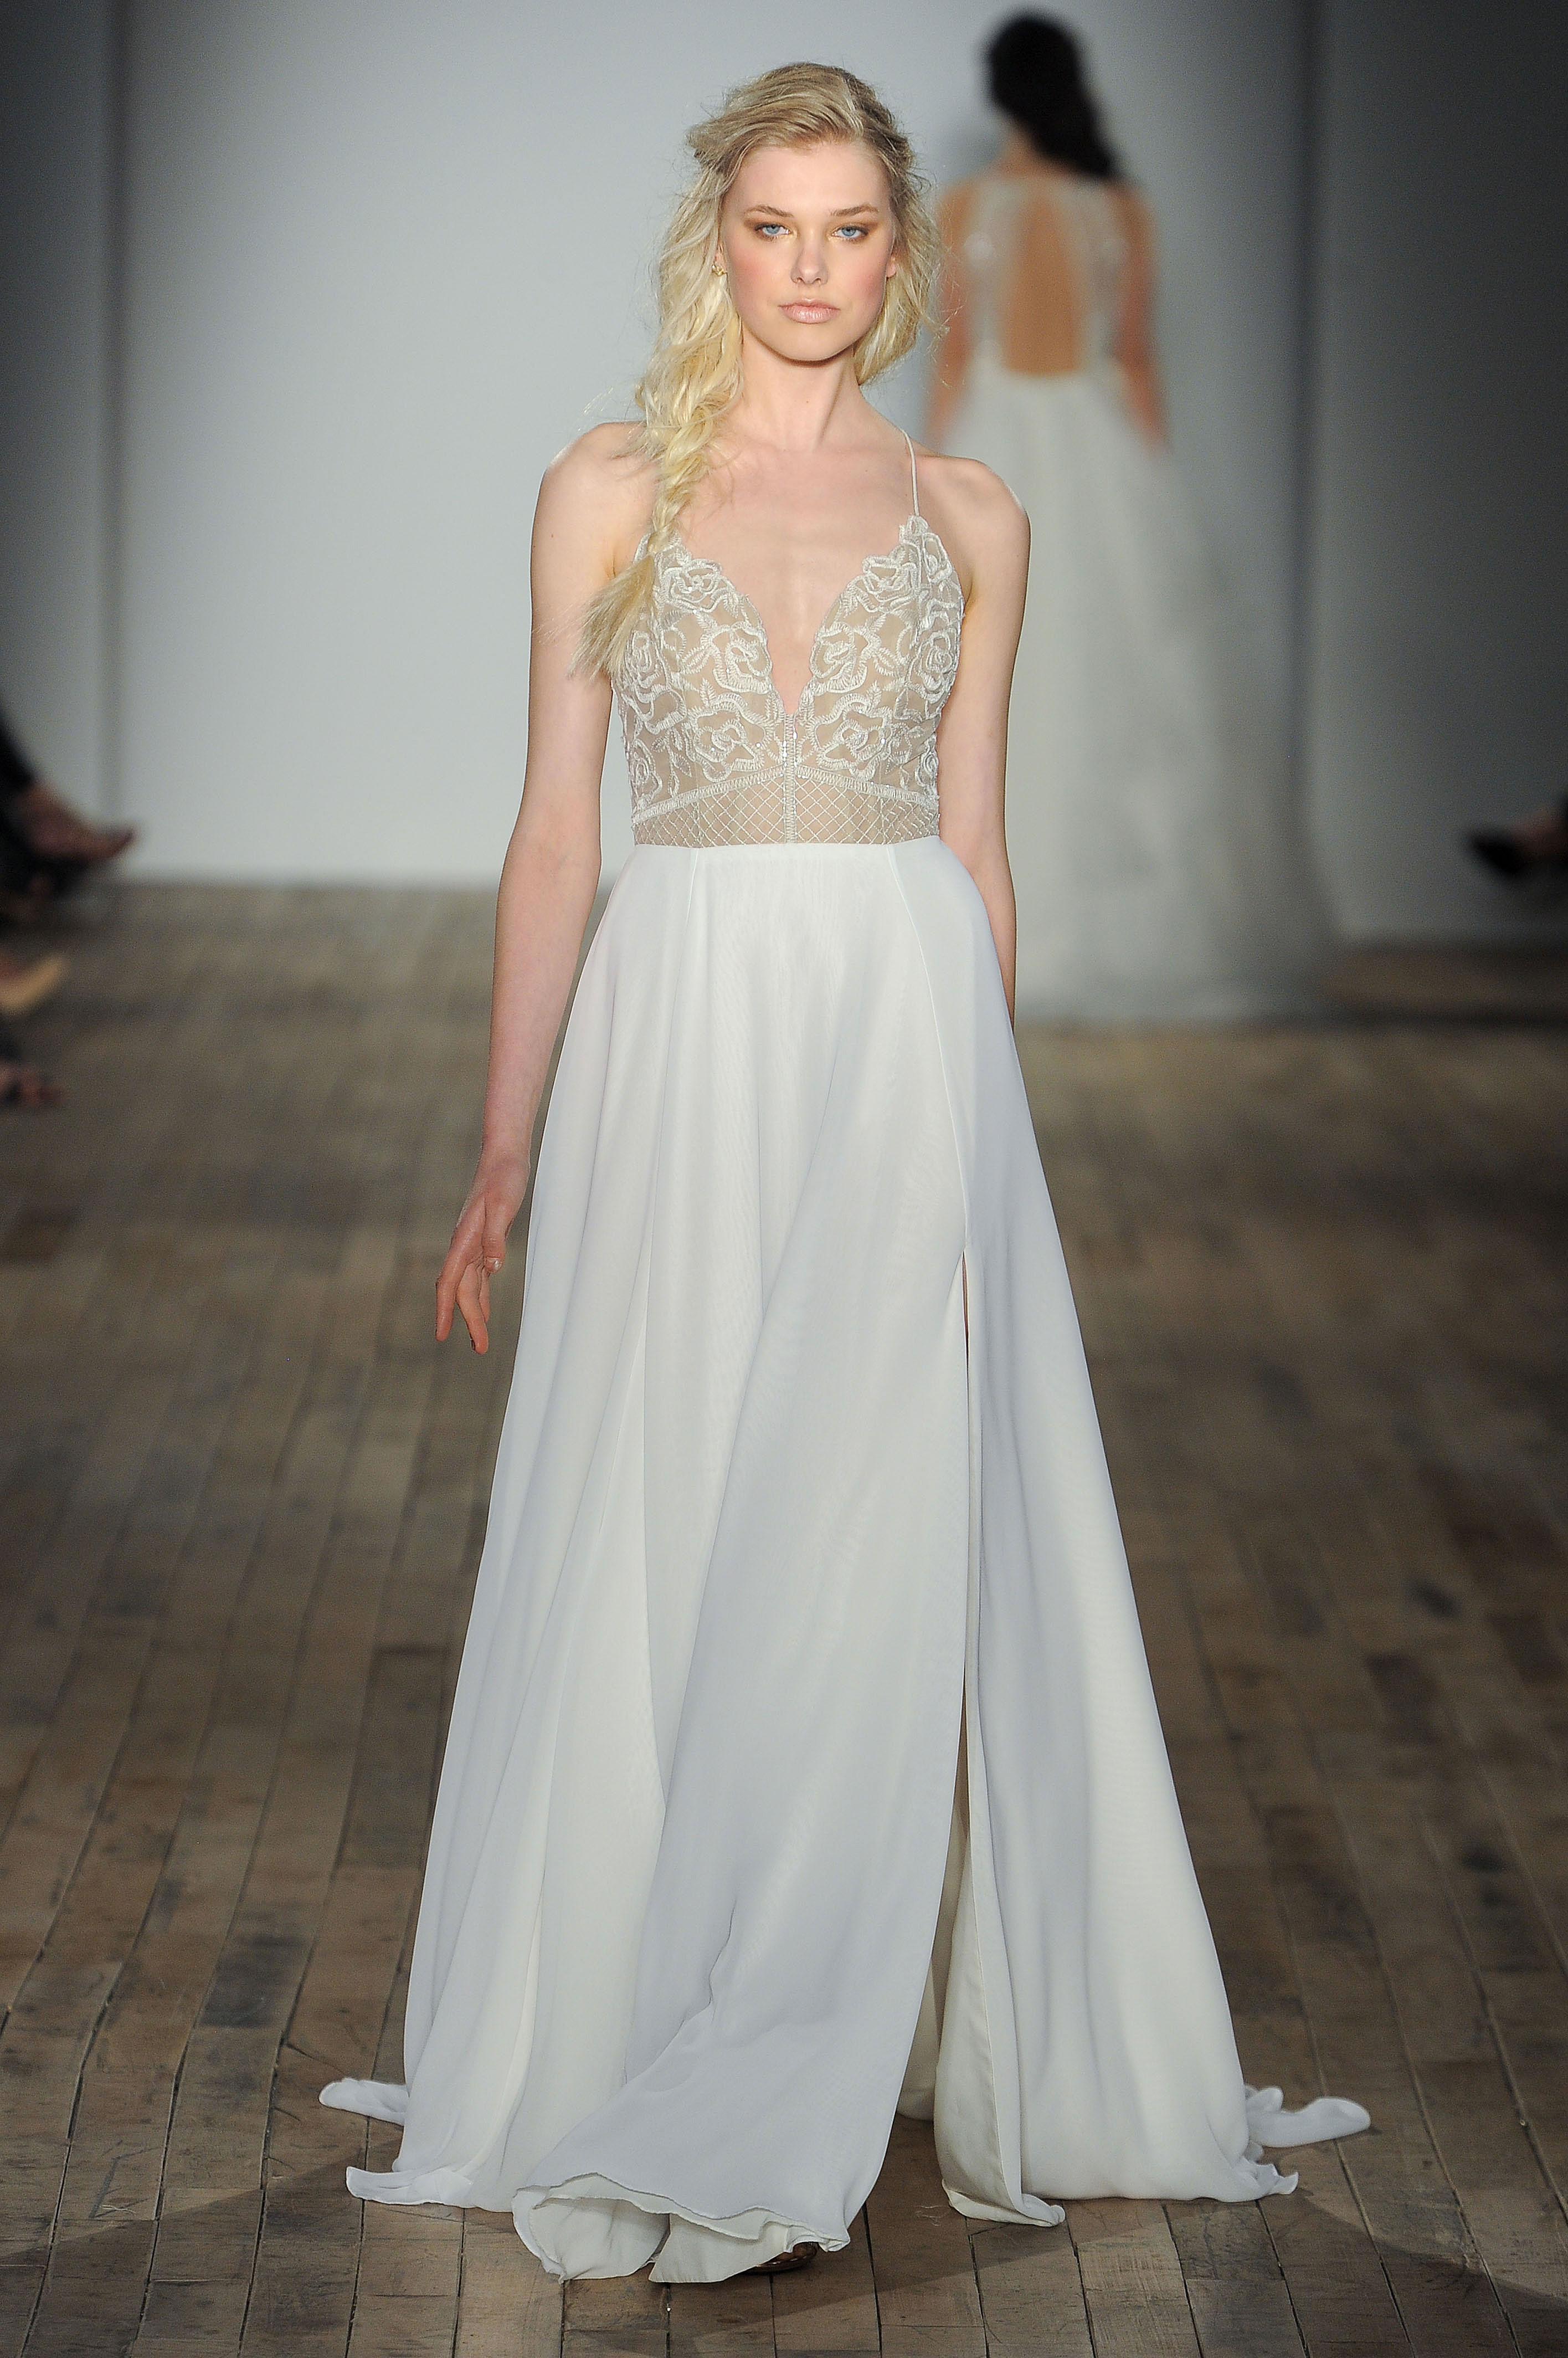 blush by hayley paige v-neck spaghetti strap wedding dress spring 2018